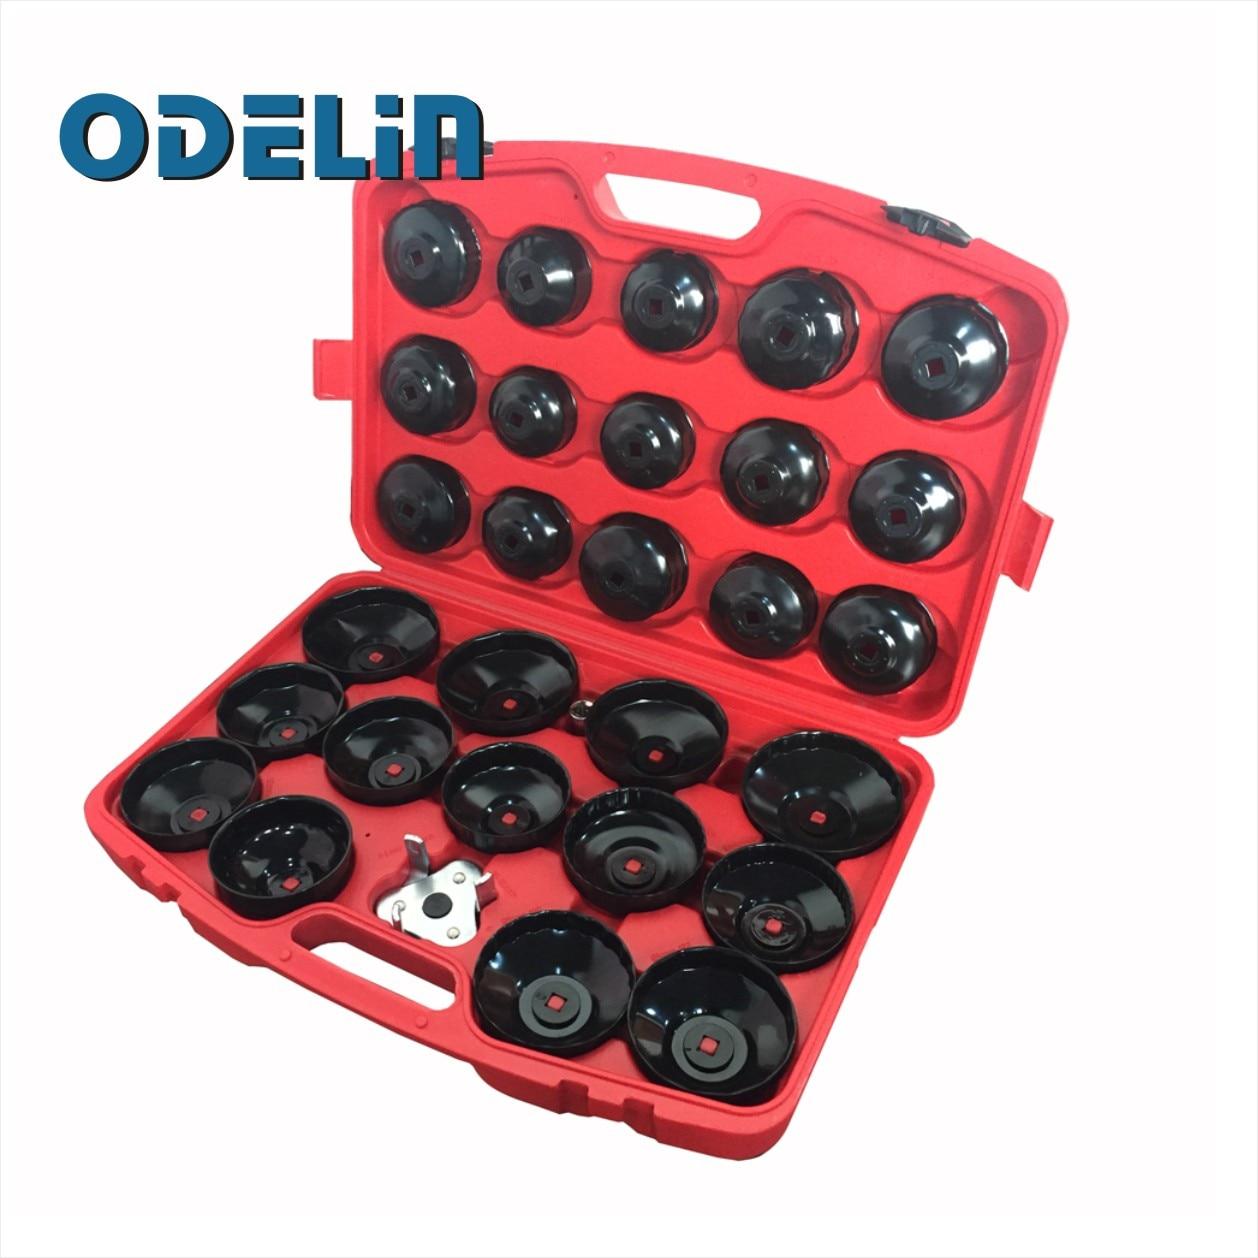 30pc Oil Filter Removal Wrench Cap Car Garage Tool Set Loosen Tighten Cup Socket